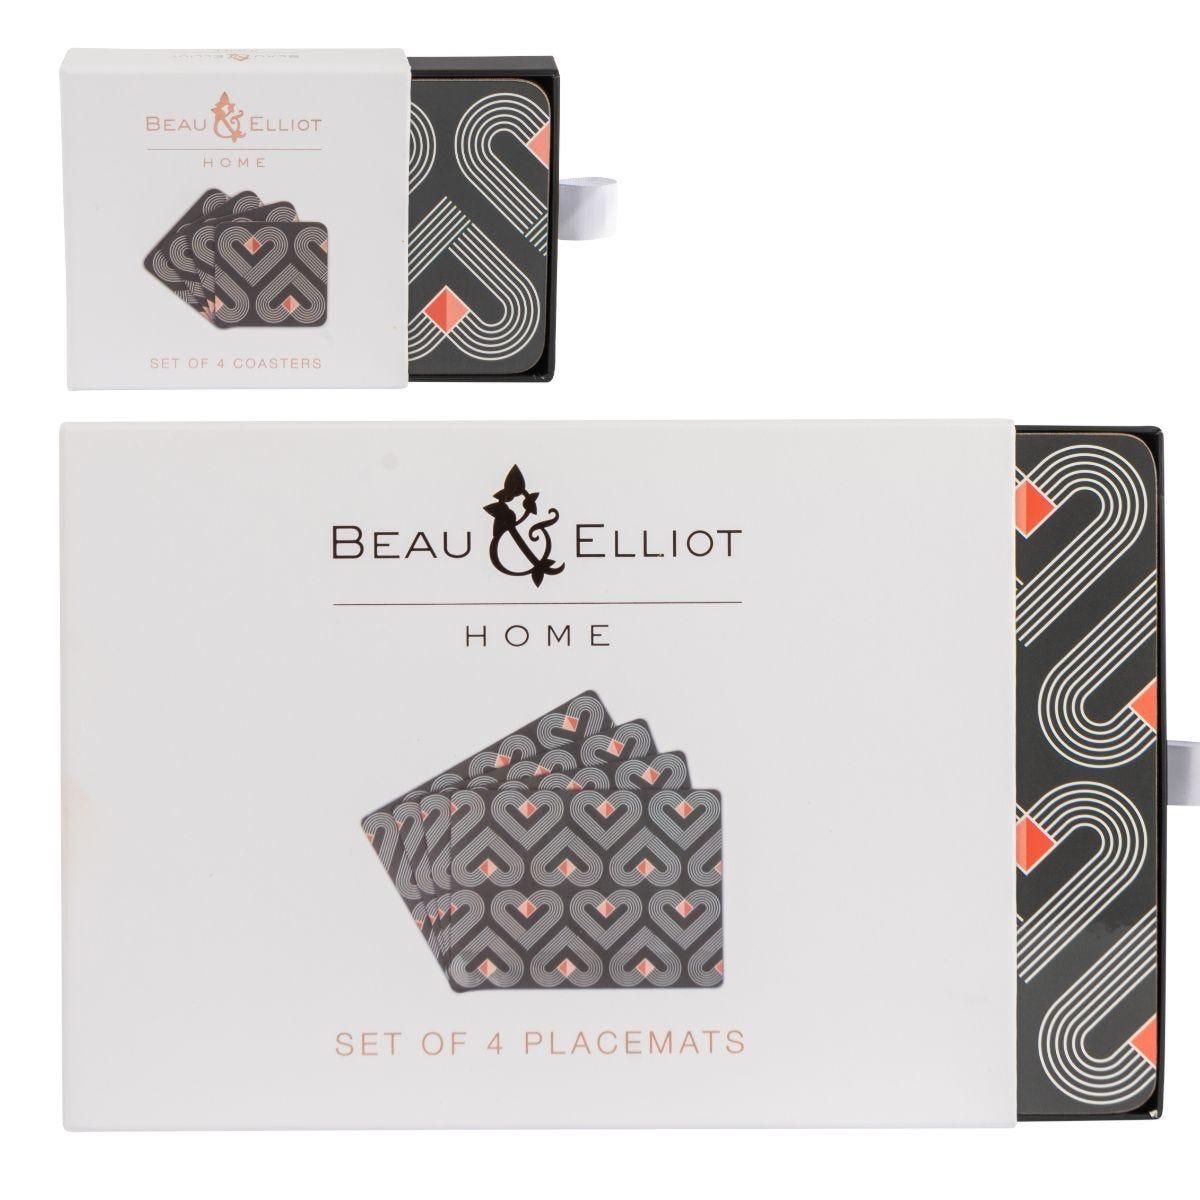 Beau & Elliot Vibe 4 Placemats and 4 Coasters - Slate